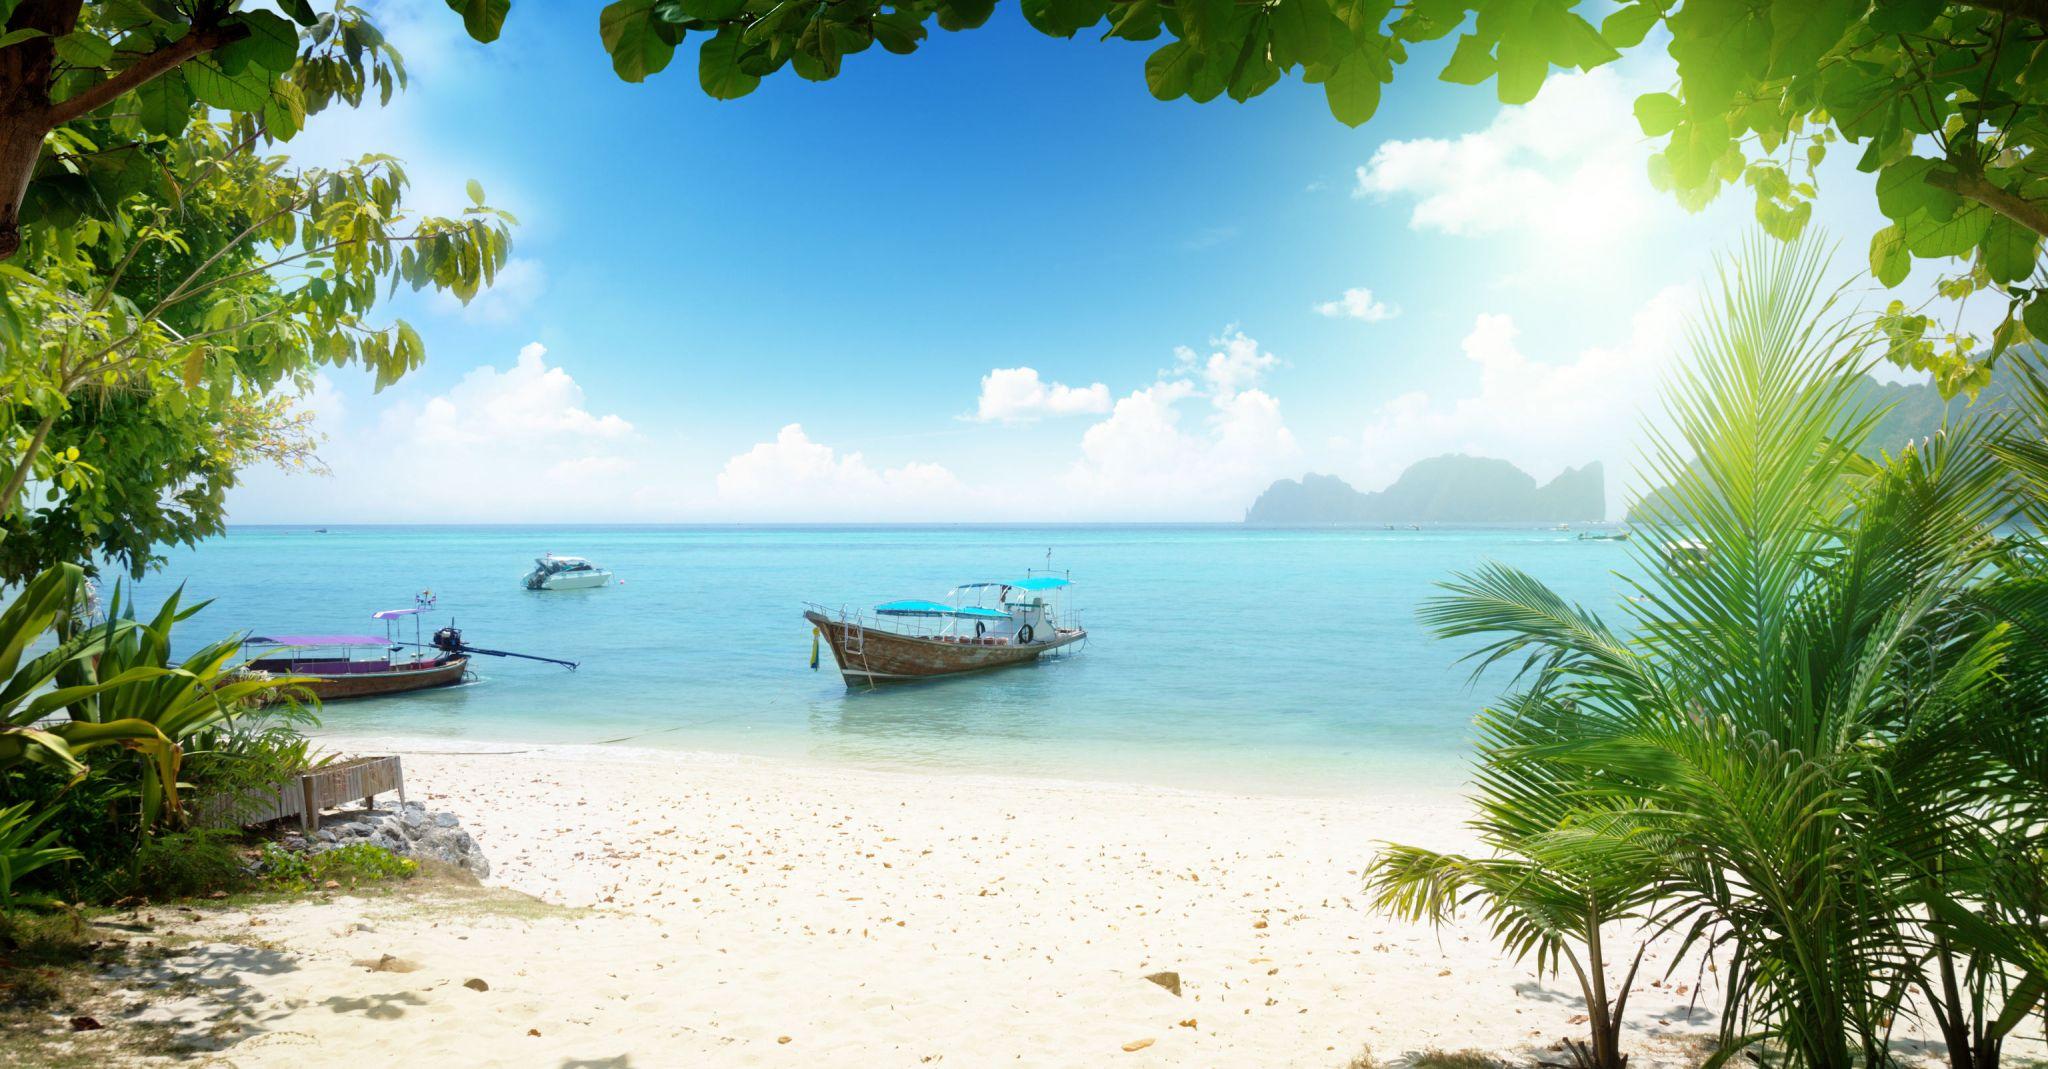 beach-boat-island-jetsetter-guides